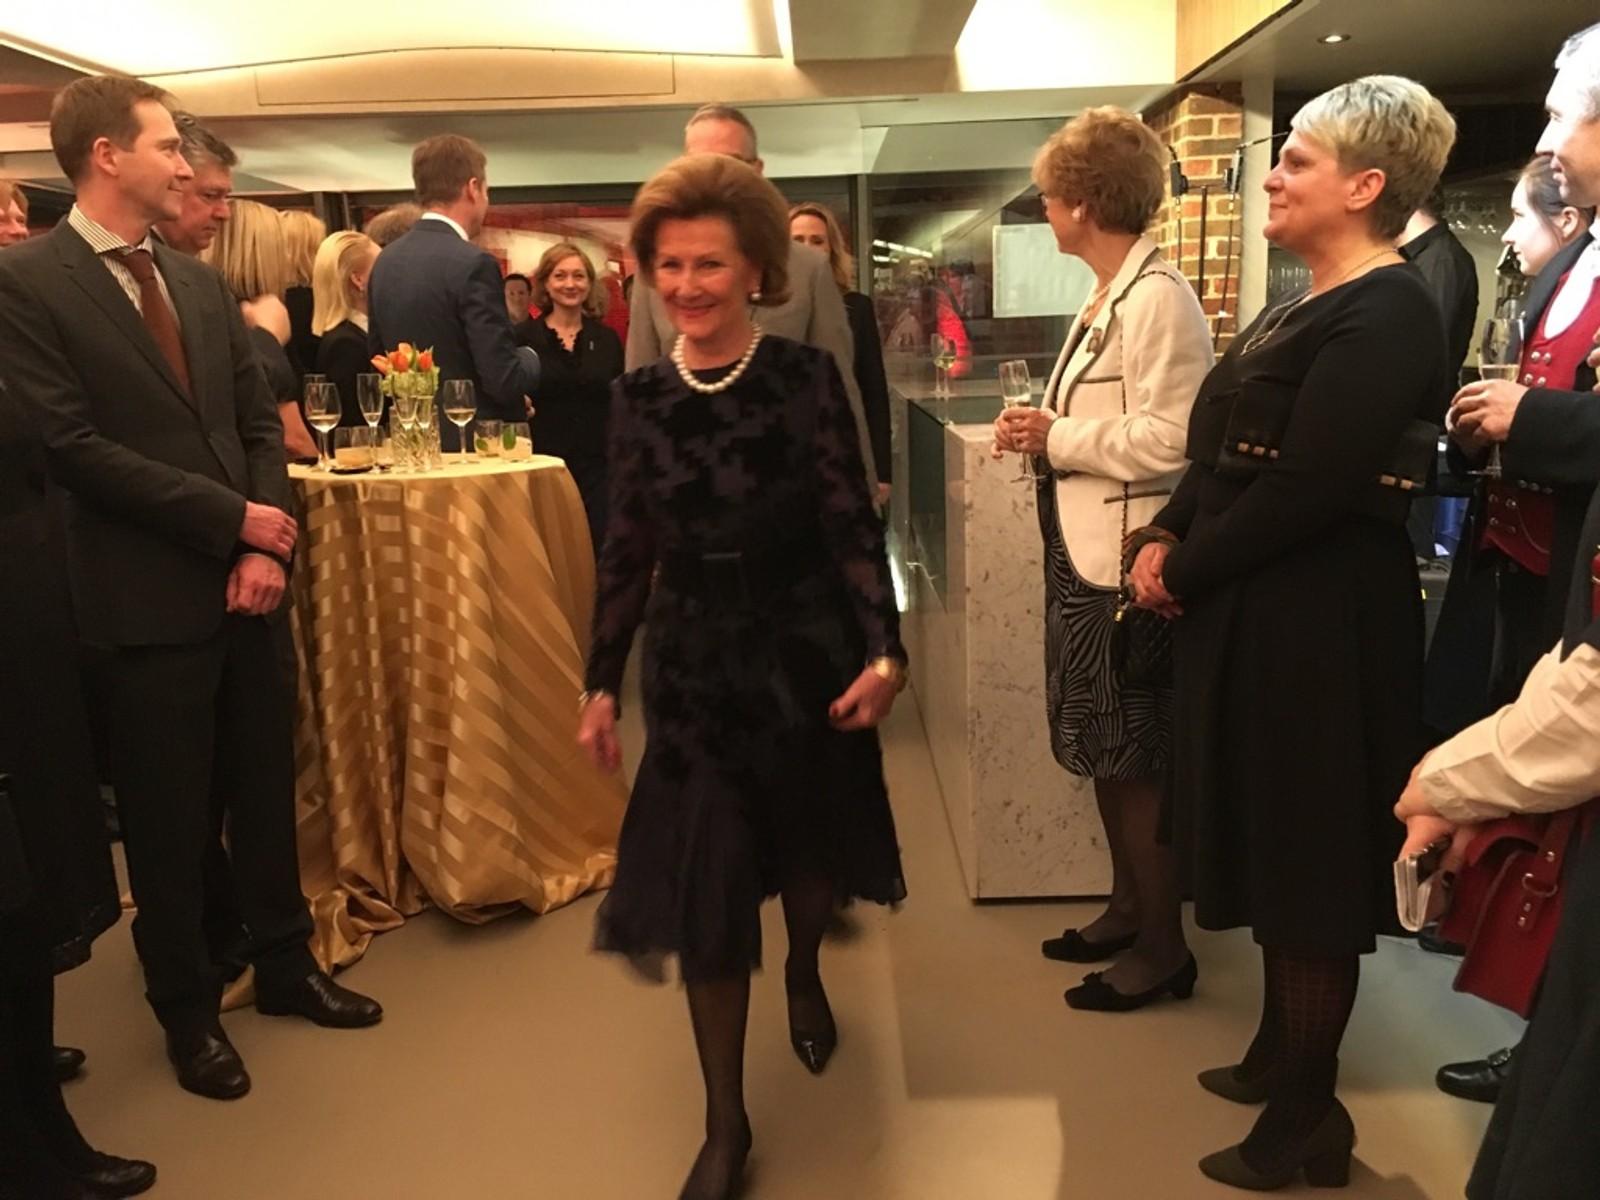 Dronning Sonja var heidersgjest på onsdagens opning.